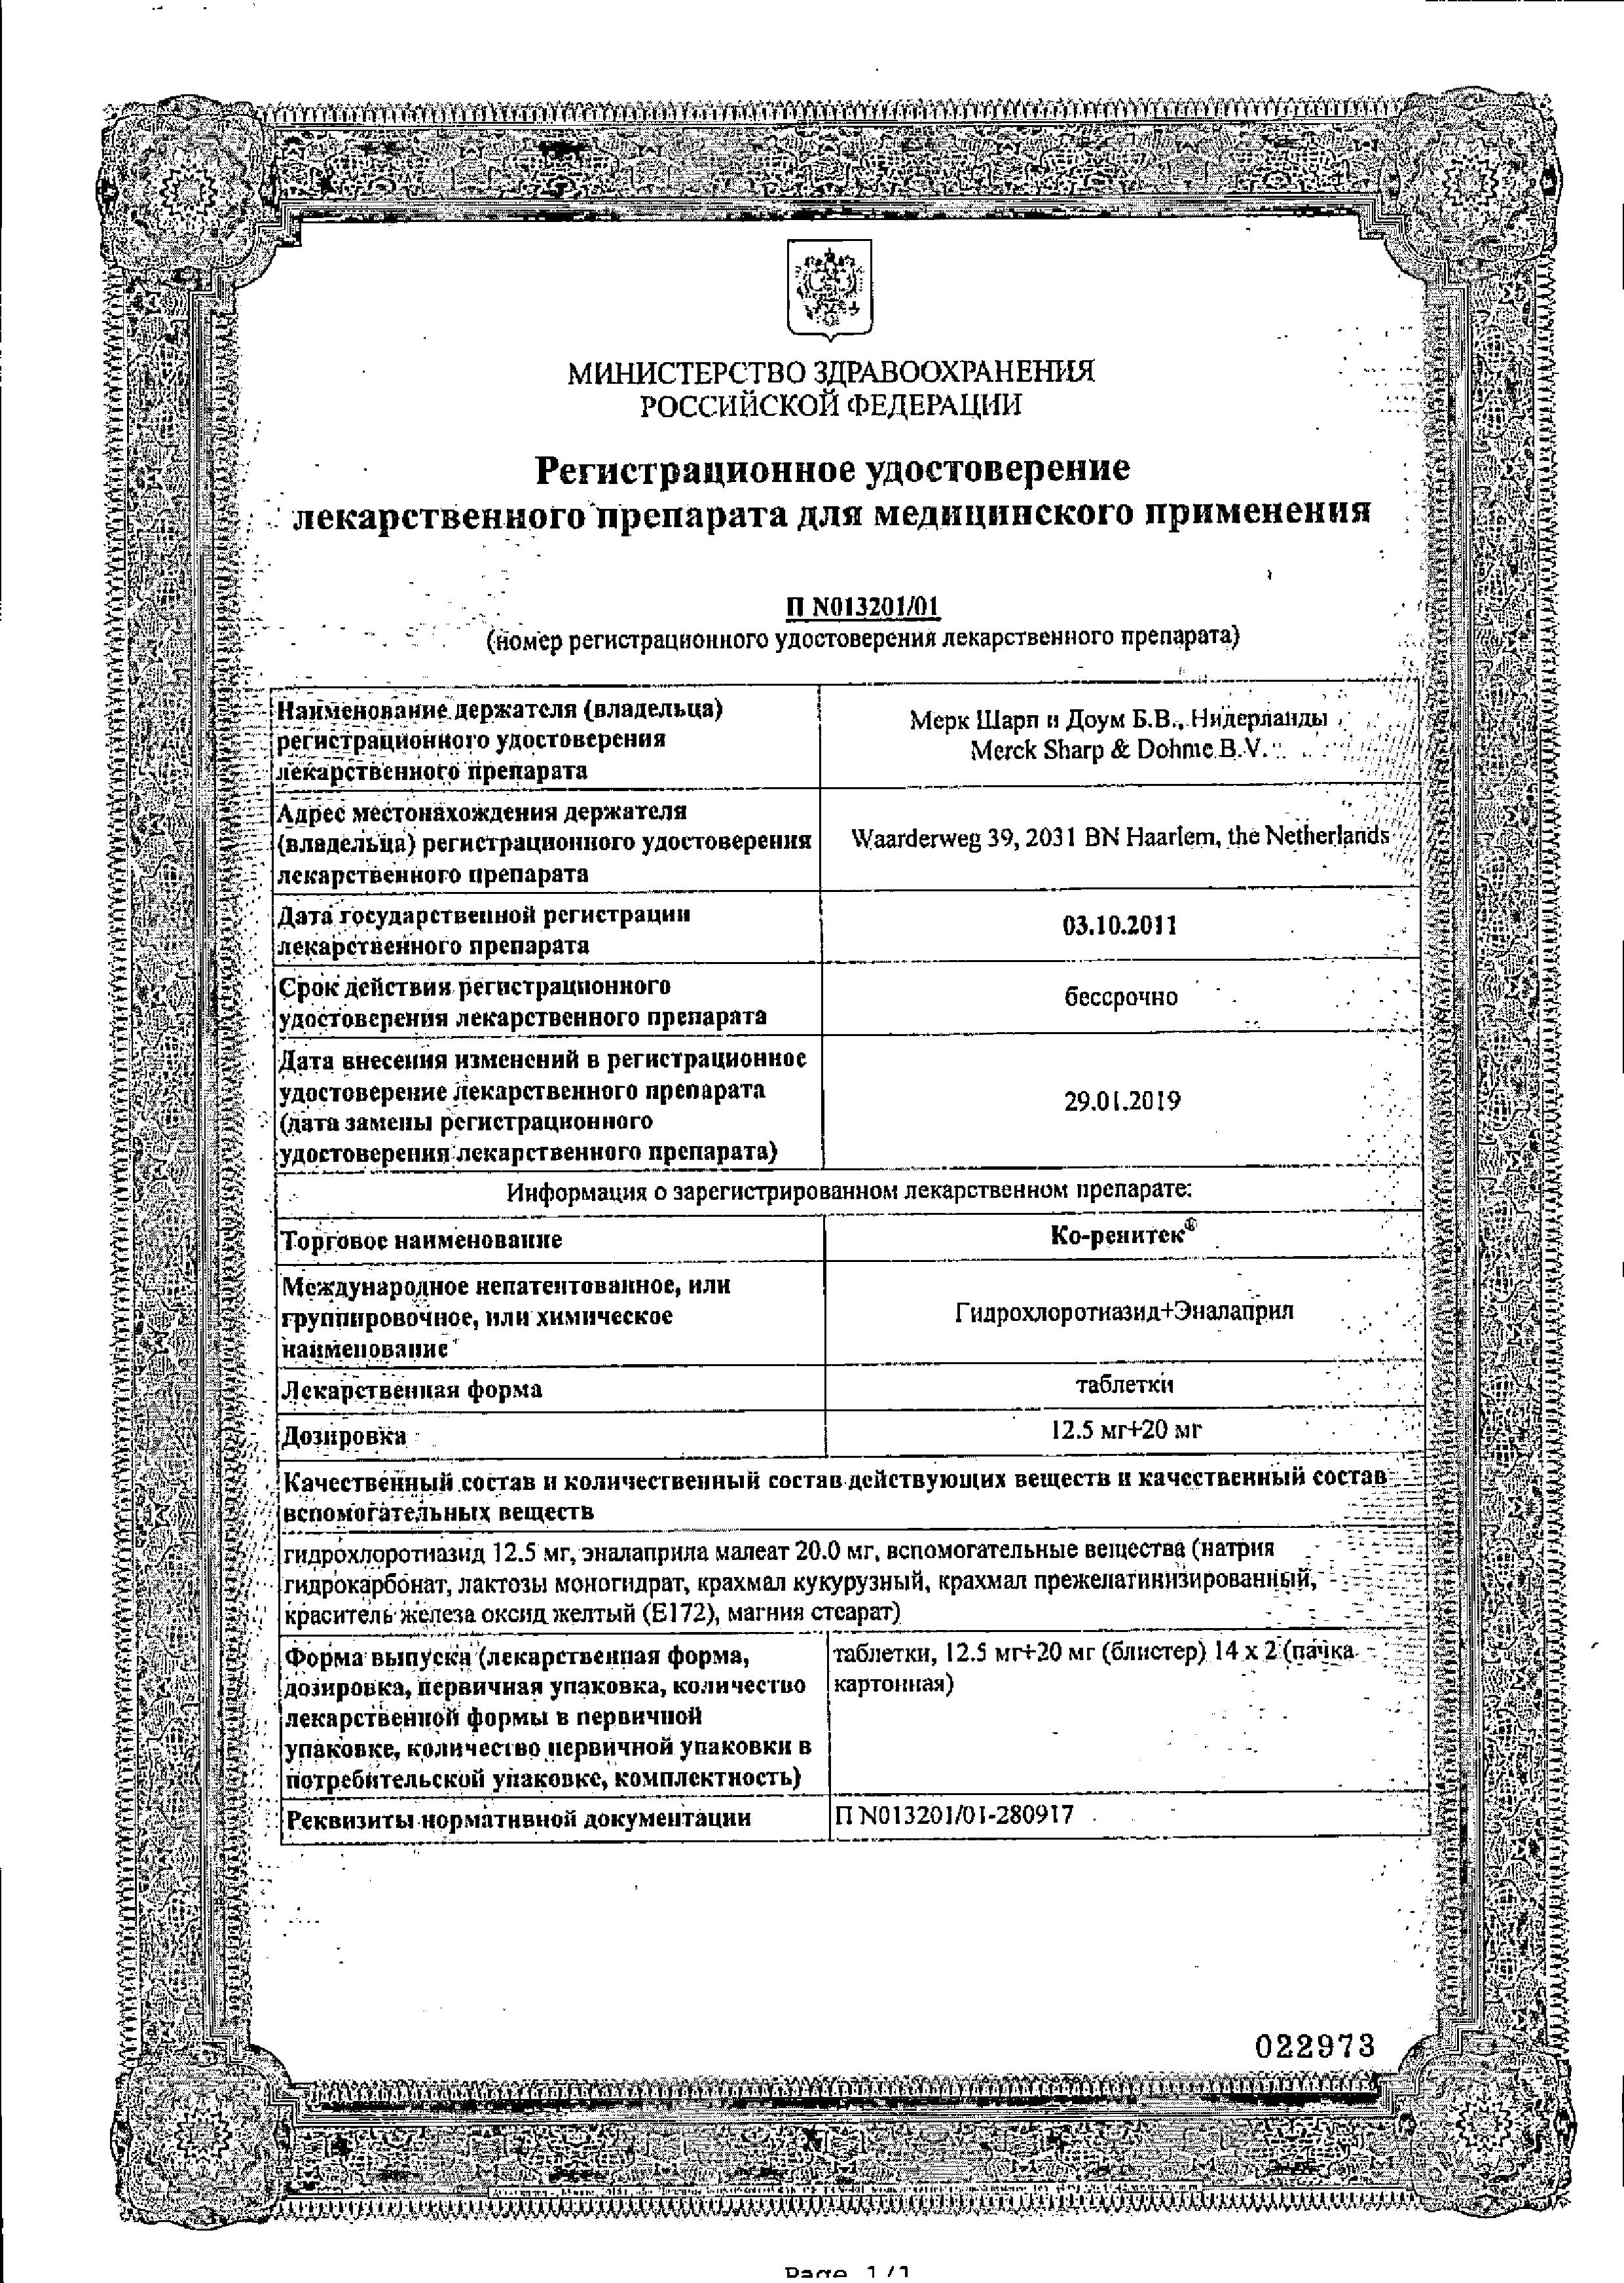 Ко-ренитек сертификат